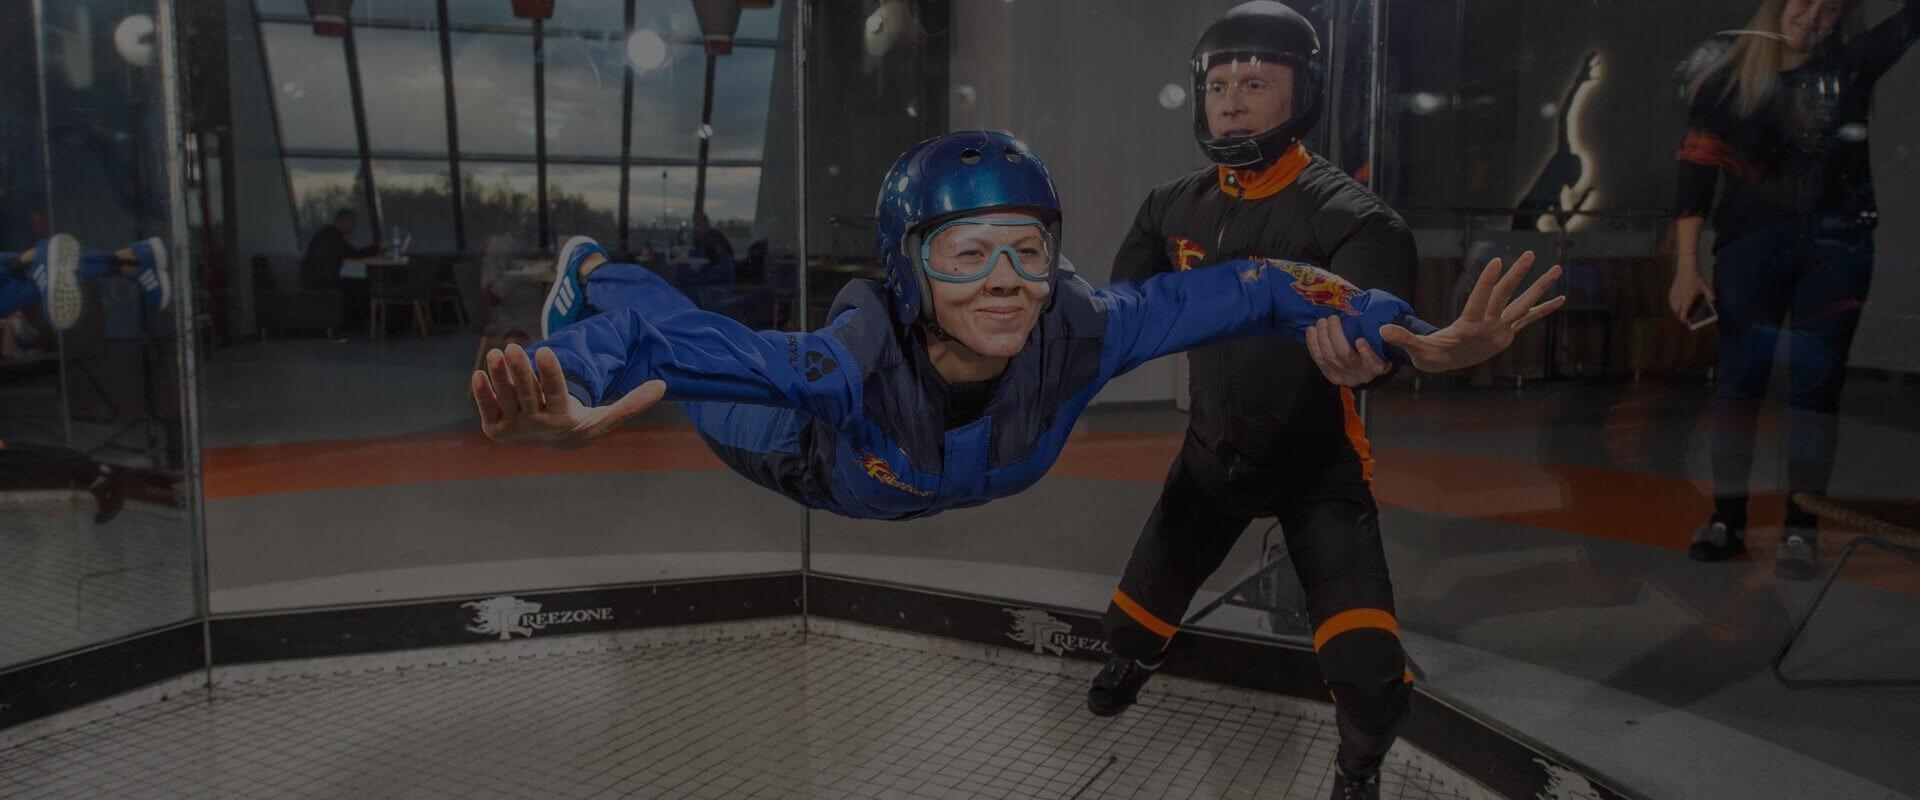 polet v aerotrube indoor skydiving 00001